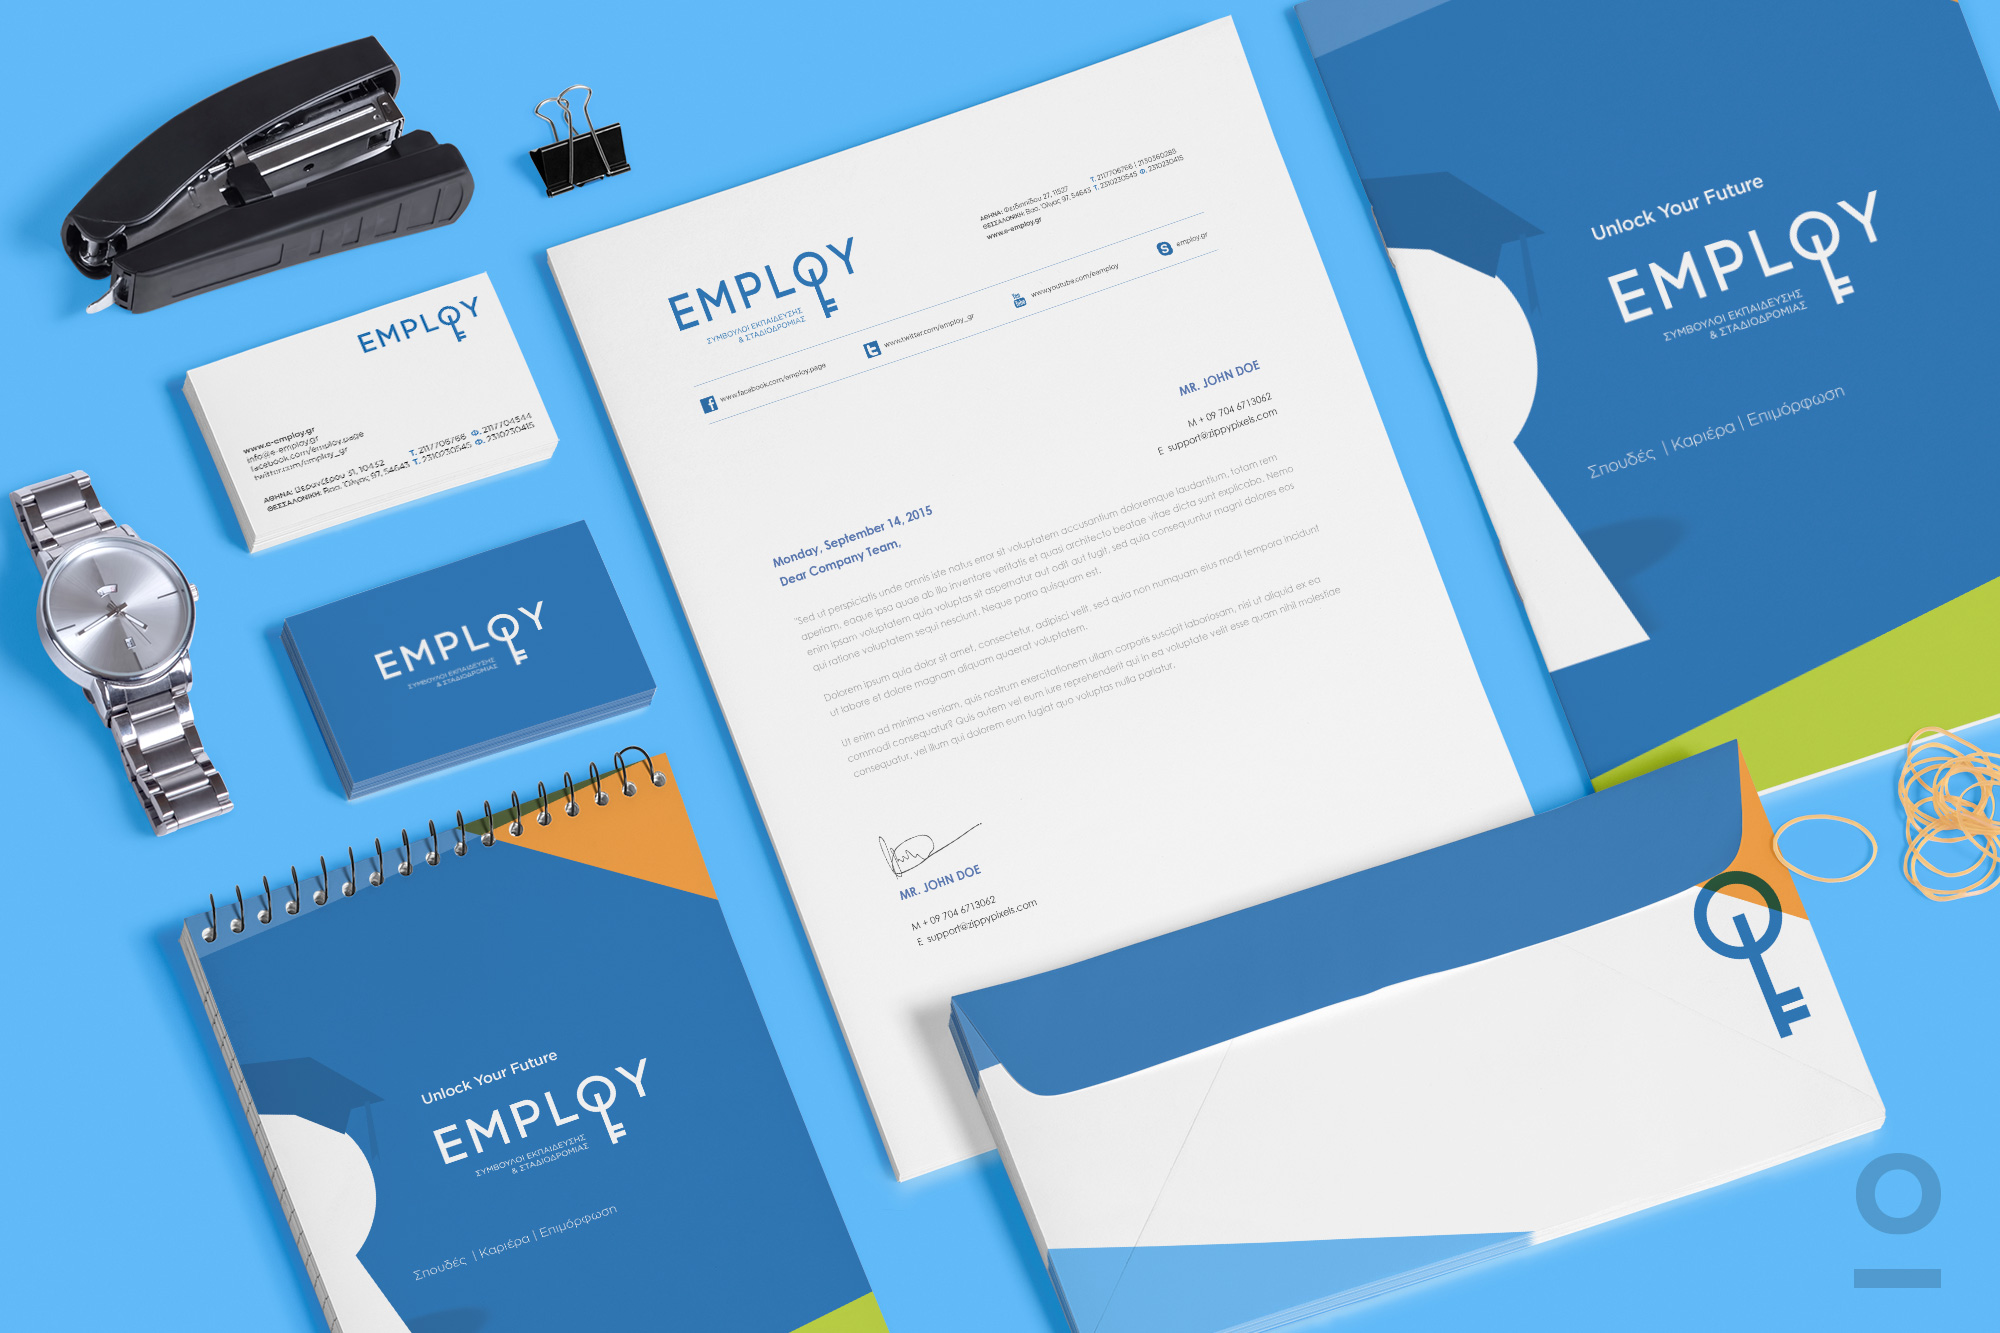 employ_branding_01